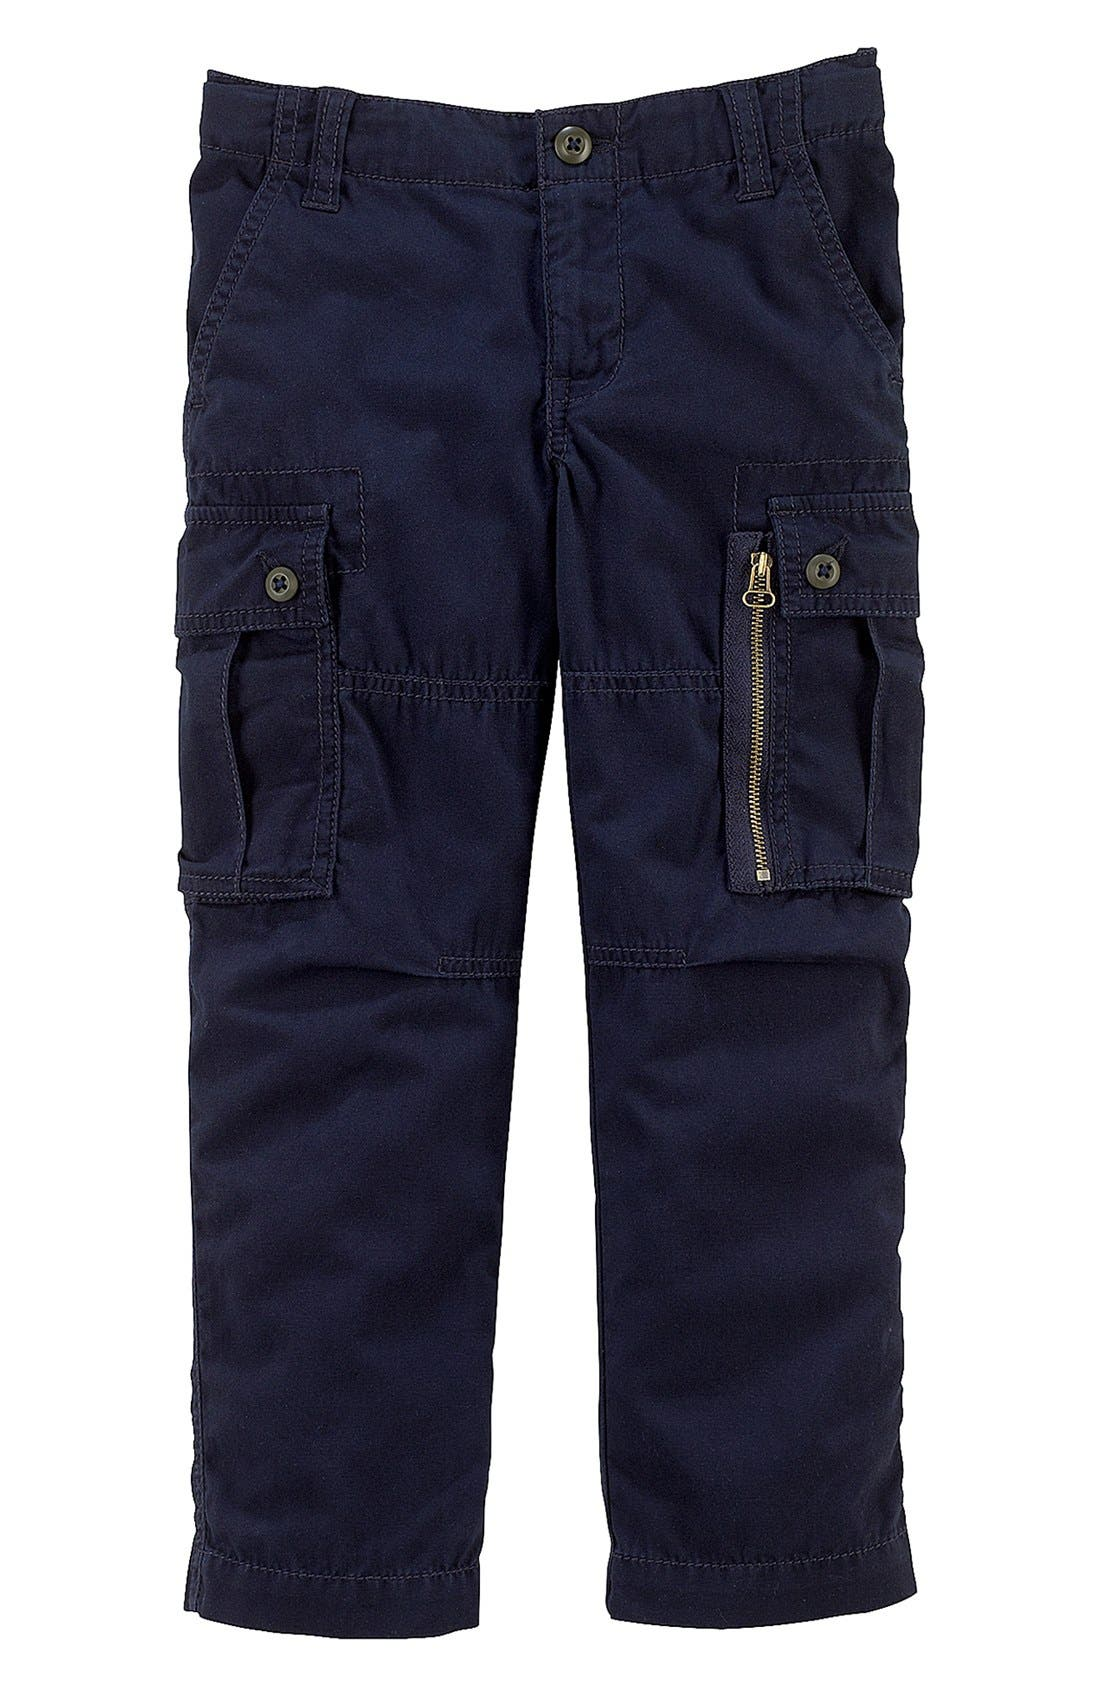 Alternate Image 1 Selected - Ralph Lauren Cargo Pants (Toddler Boys)